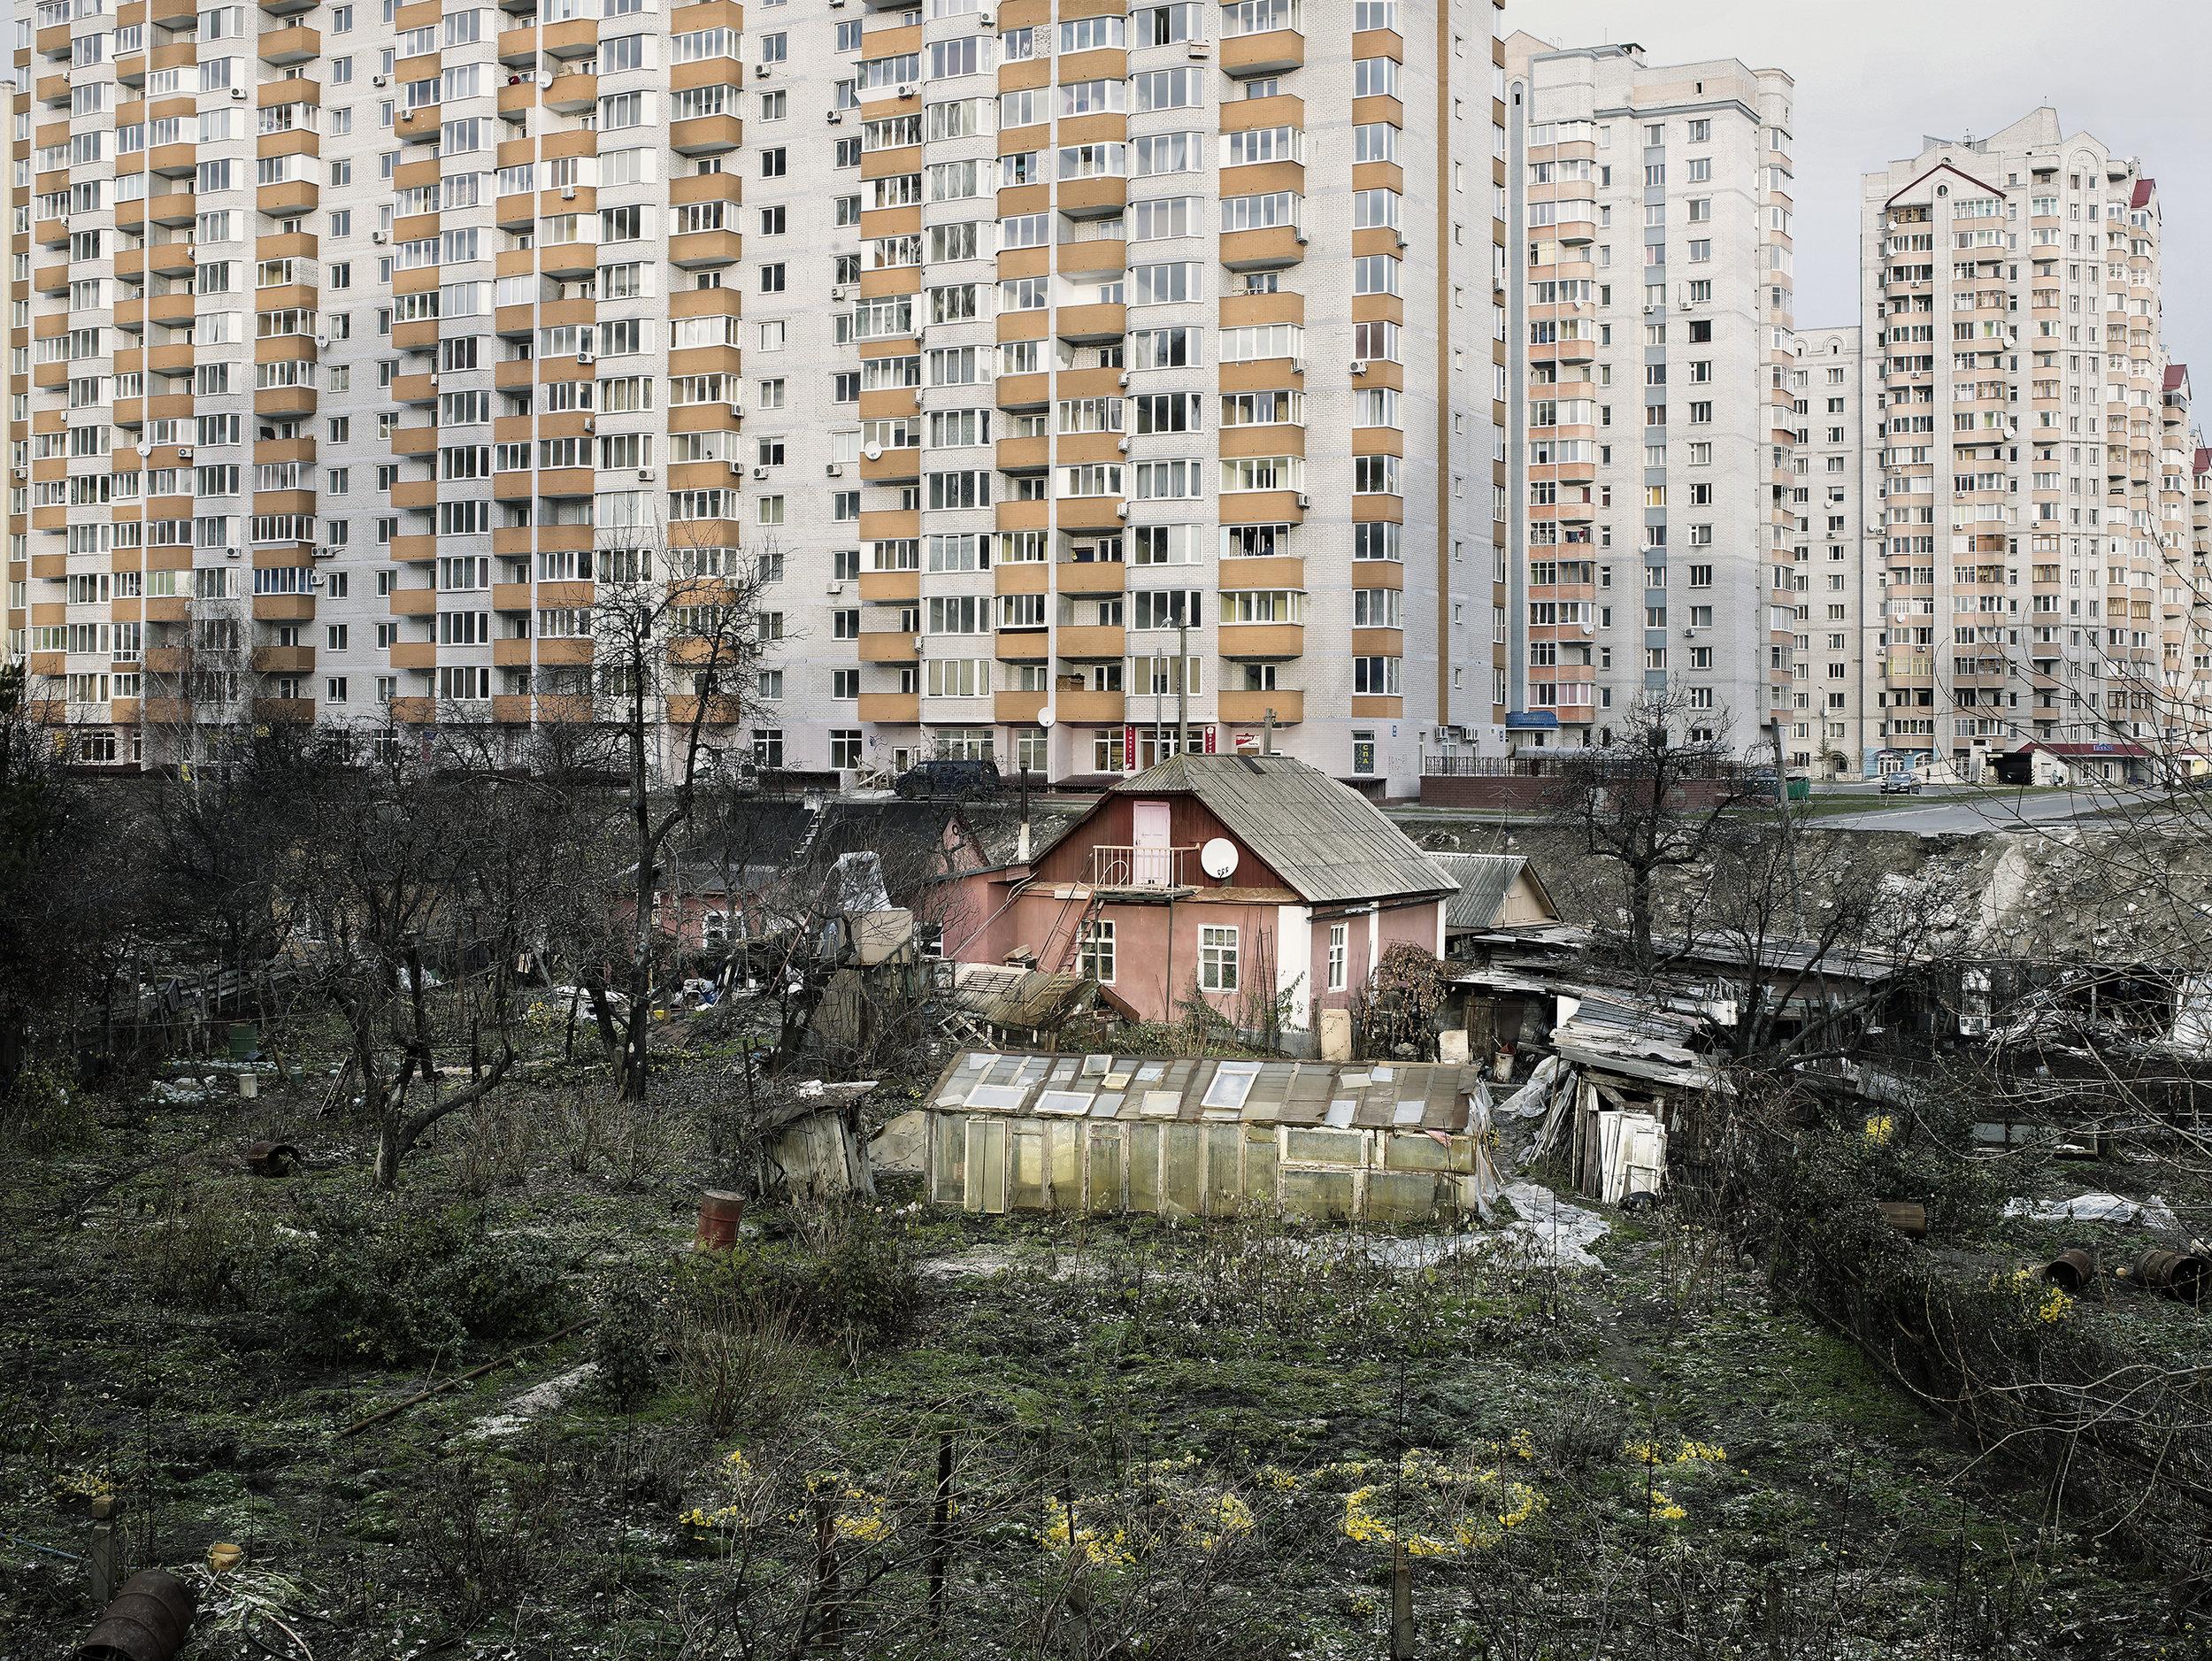 Neighborhood under renovation 1, Kiev, Ukraine, 2007.